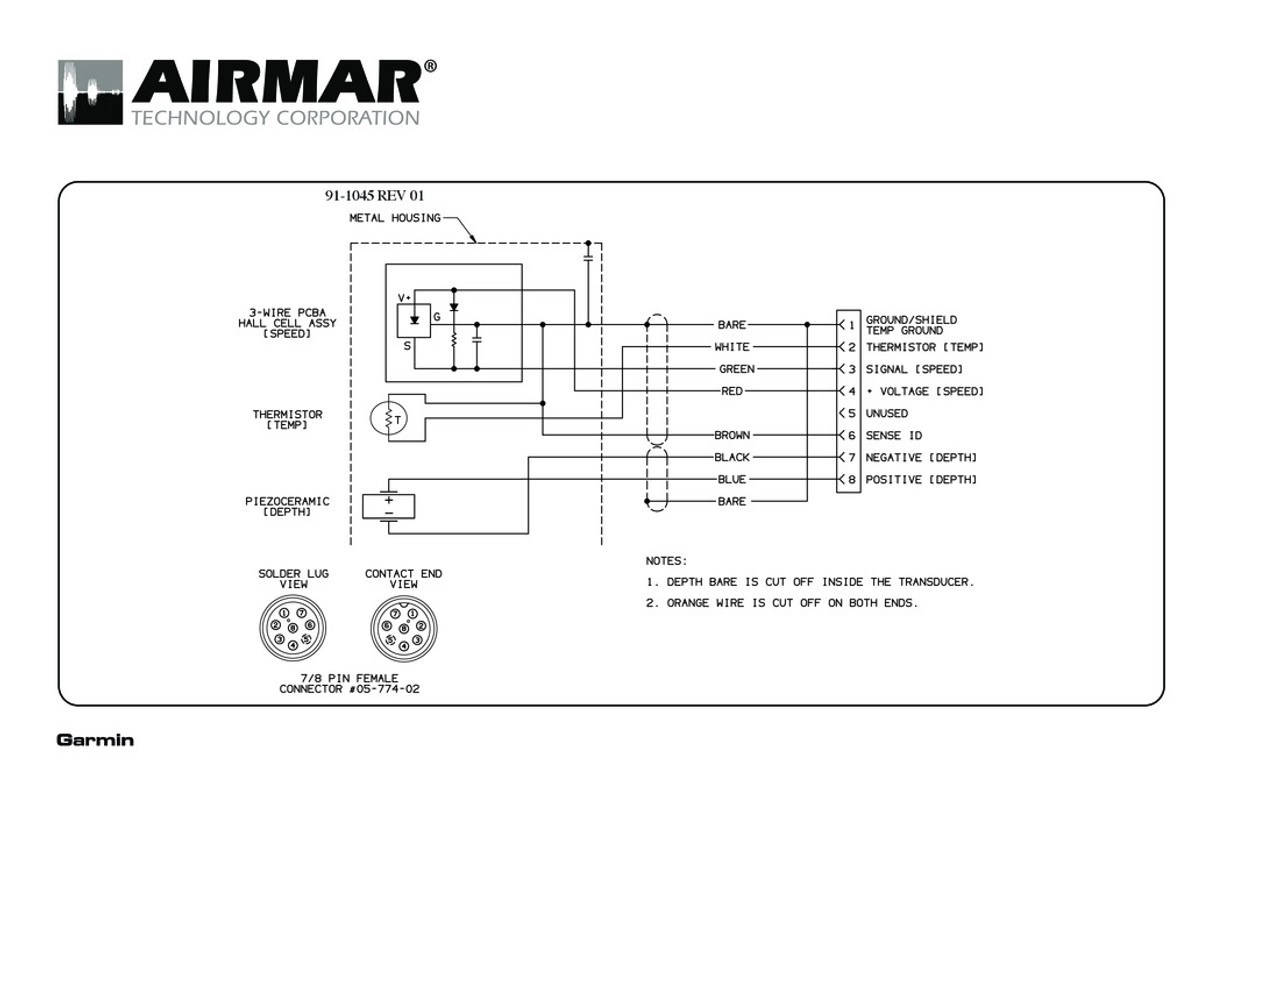 medium resolution of airmar wiring diagram garmin b744 8 pin d s t blue bottle marine garmin marine wiring diagrams